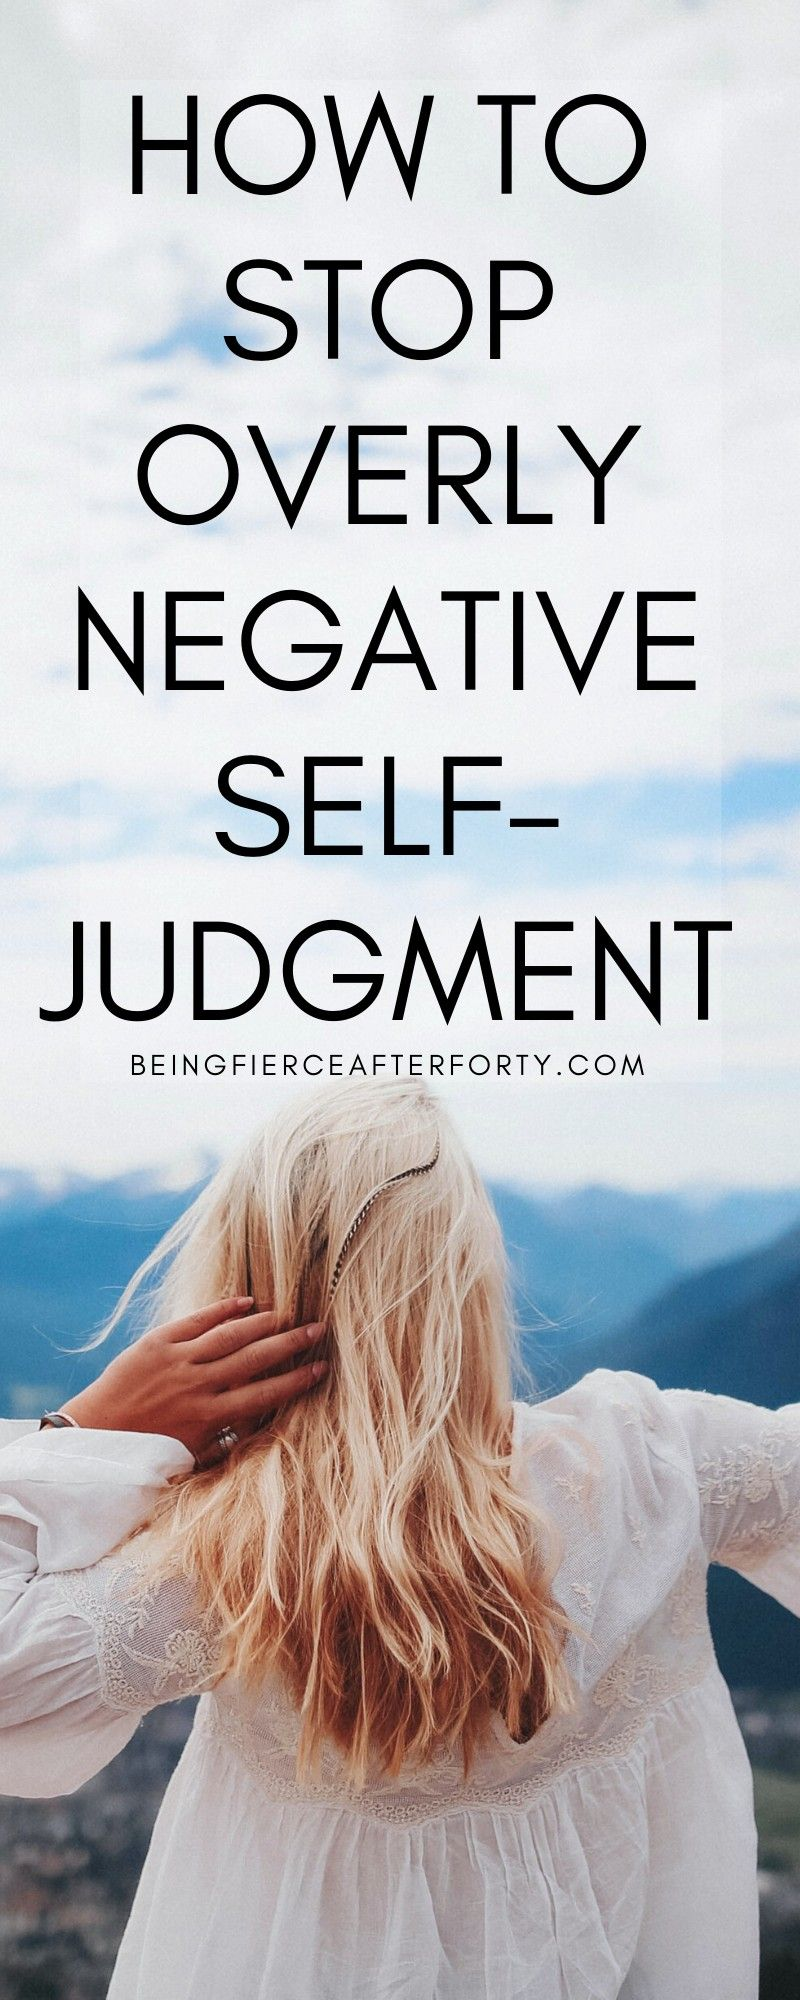 Self Help Silence Your Inner Critic in 2020 Self help